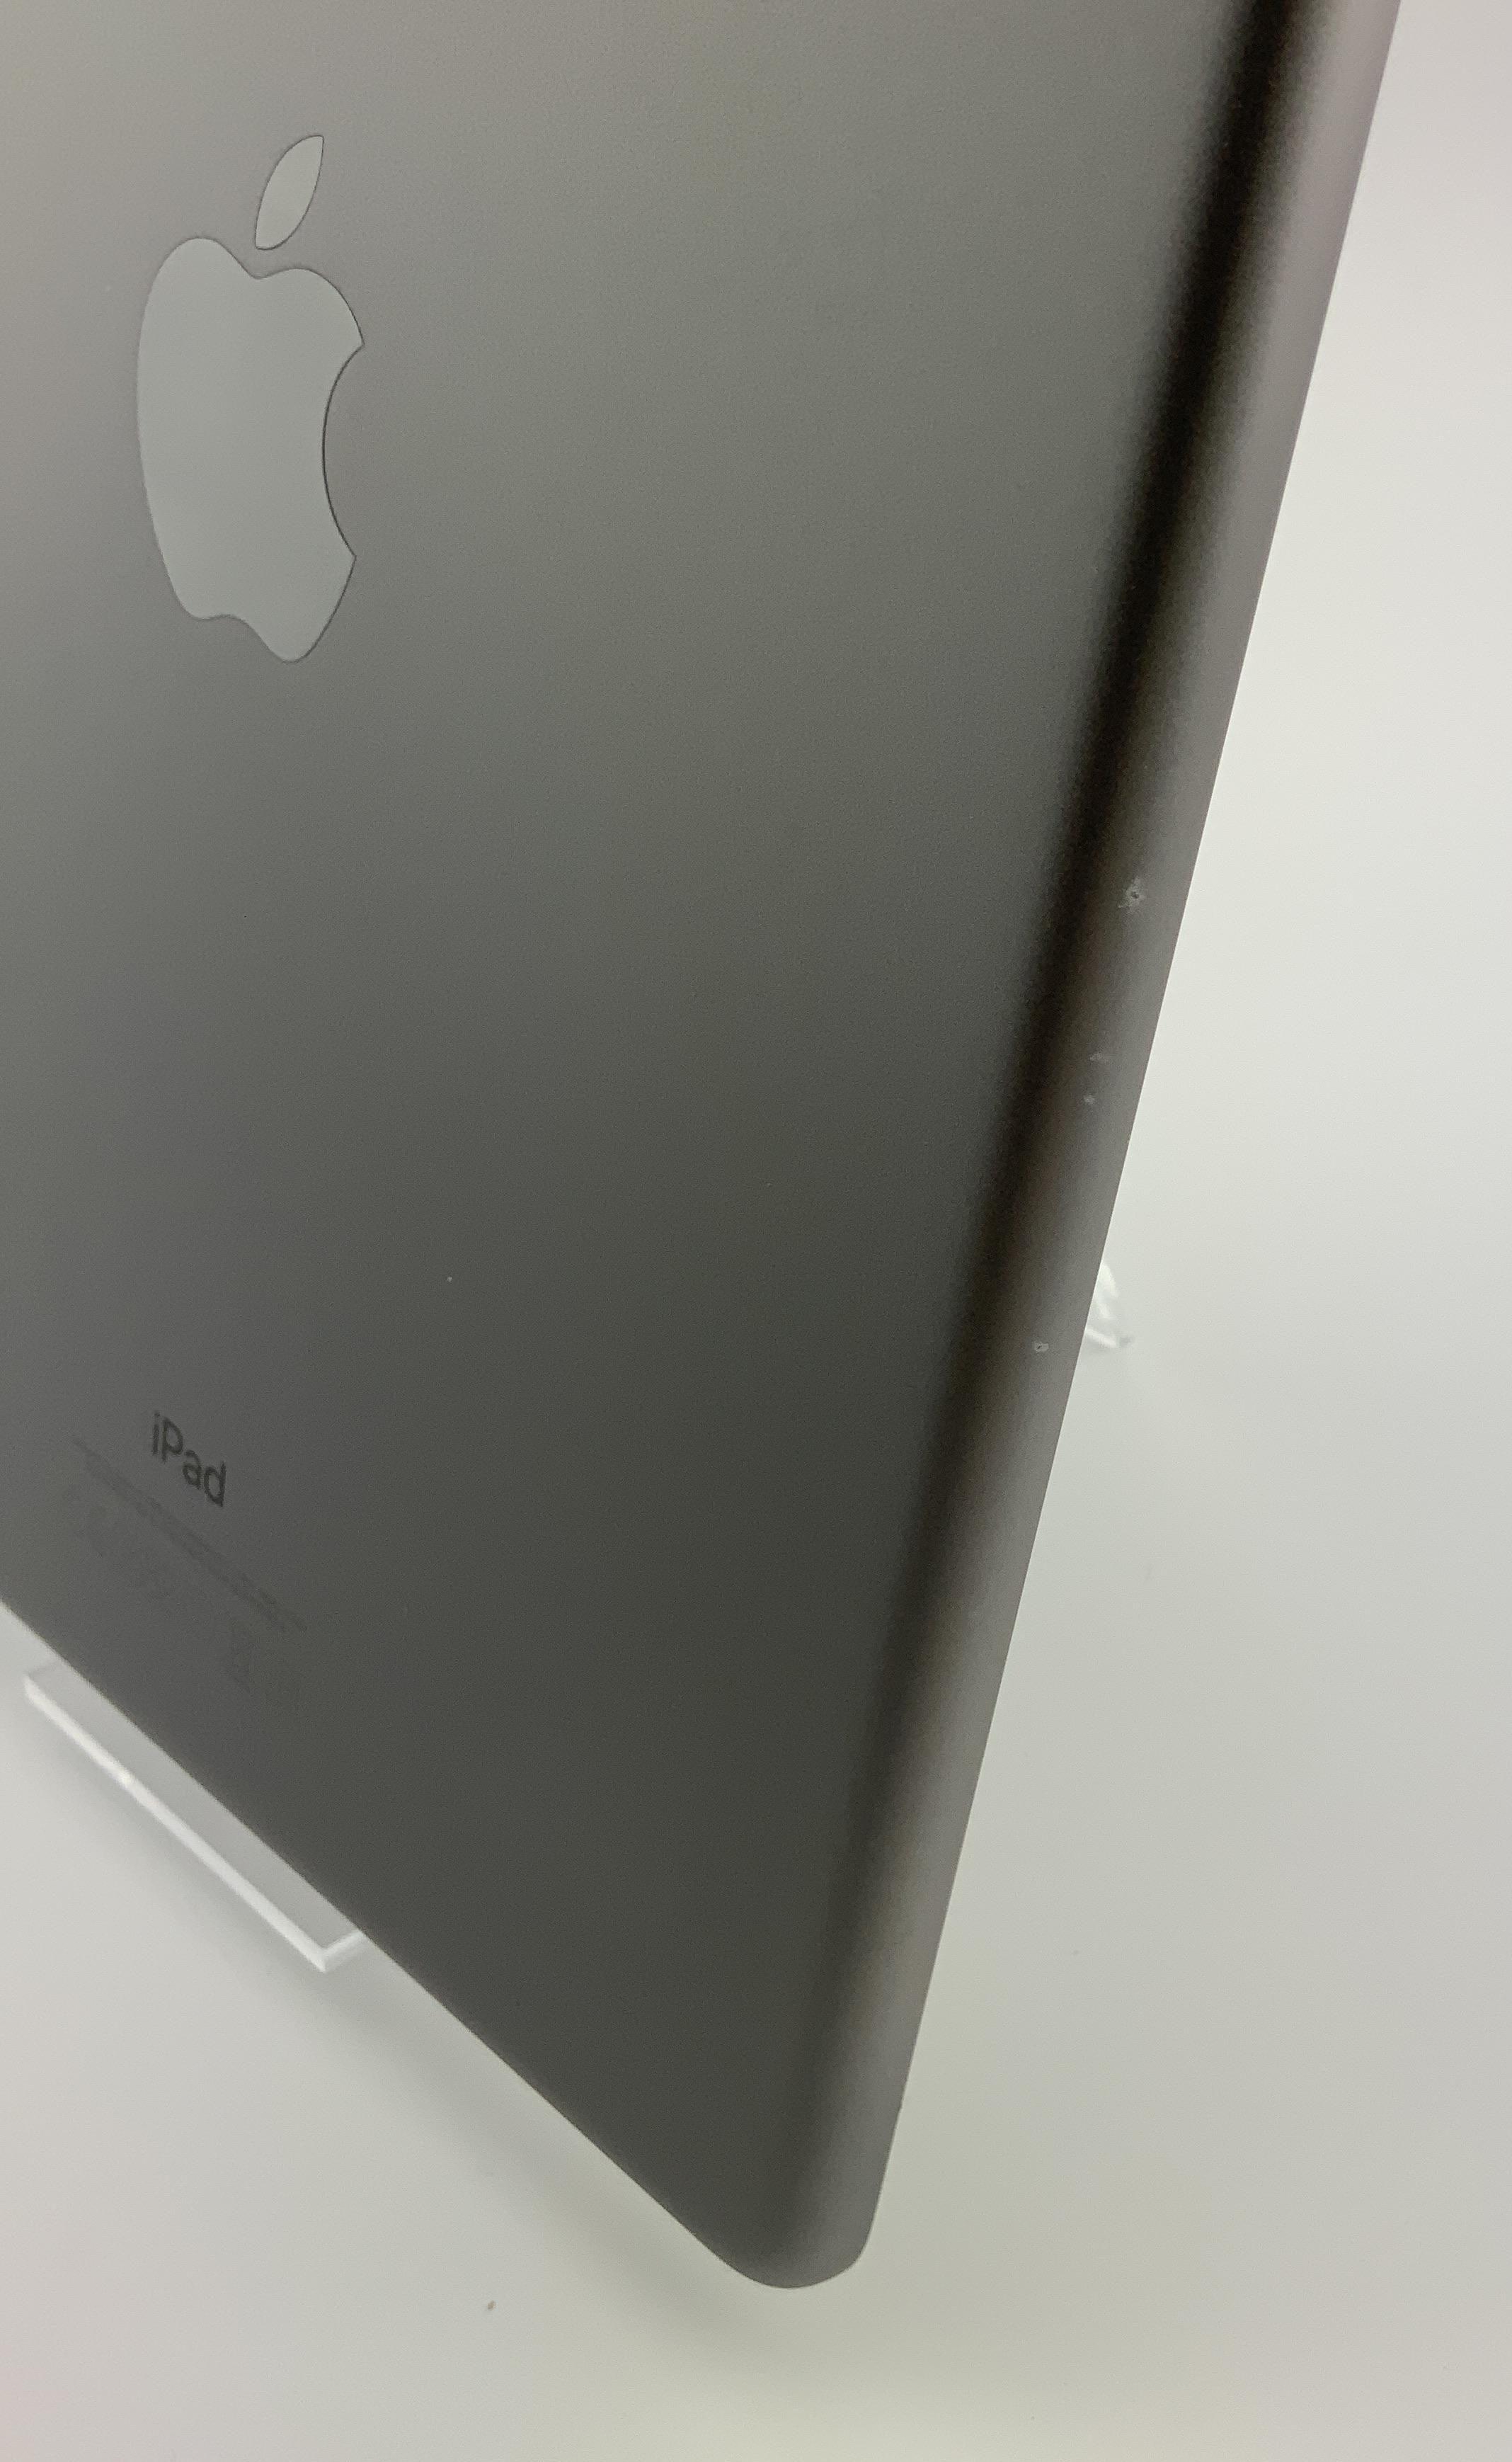 iPad 5 Wi-Fi + Cellular 128GB, 128GB, Space Gray, imagen 3